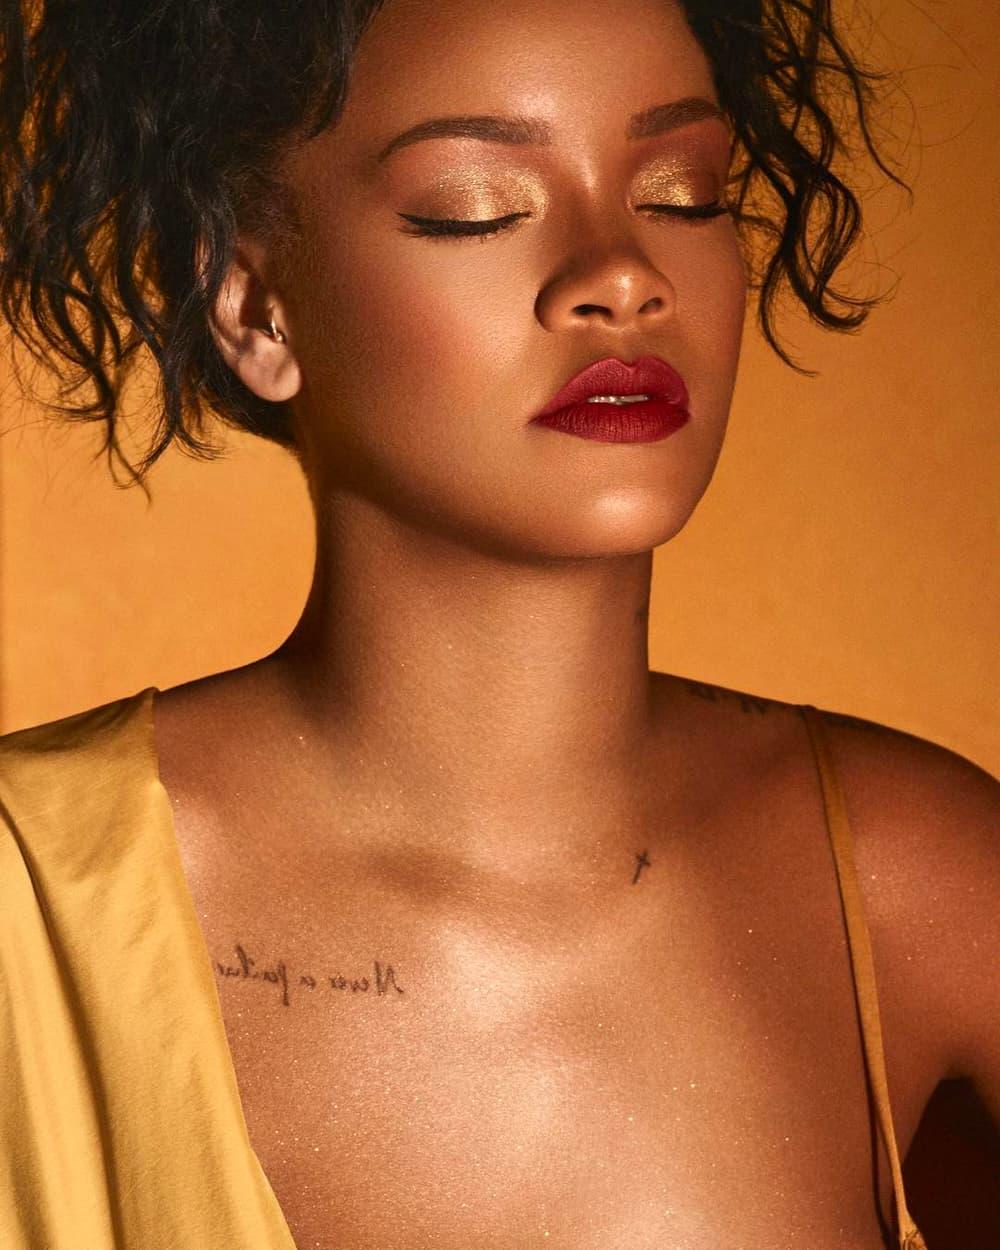 Rihanna Fenty Beauty Flyliner Liquid Eyeliner Pro Filt'r Eye Primer Moroccan Spice Eyeshadow Palette Campaign July 6